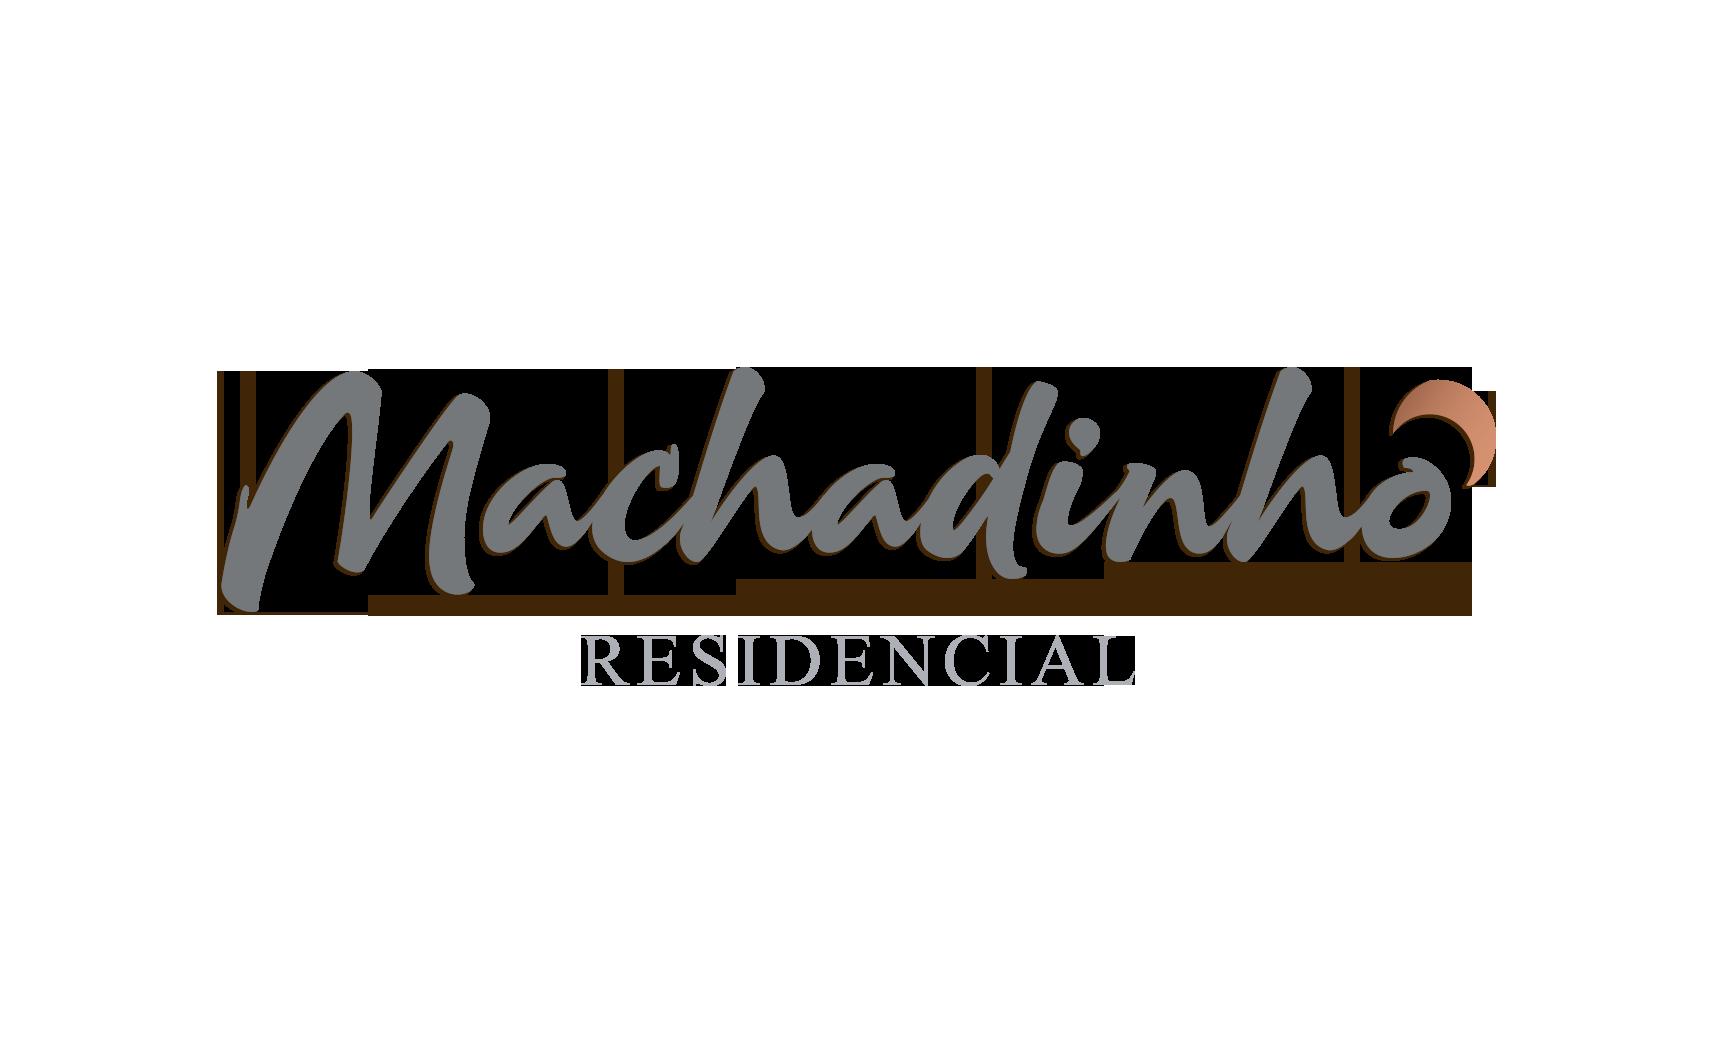 Residencial Machadinho